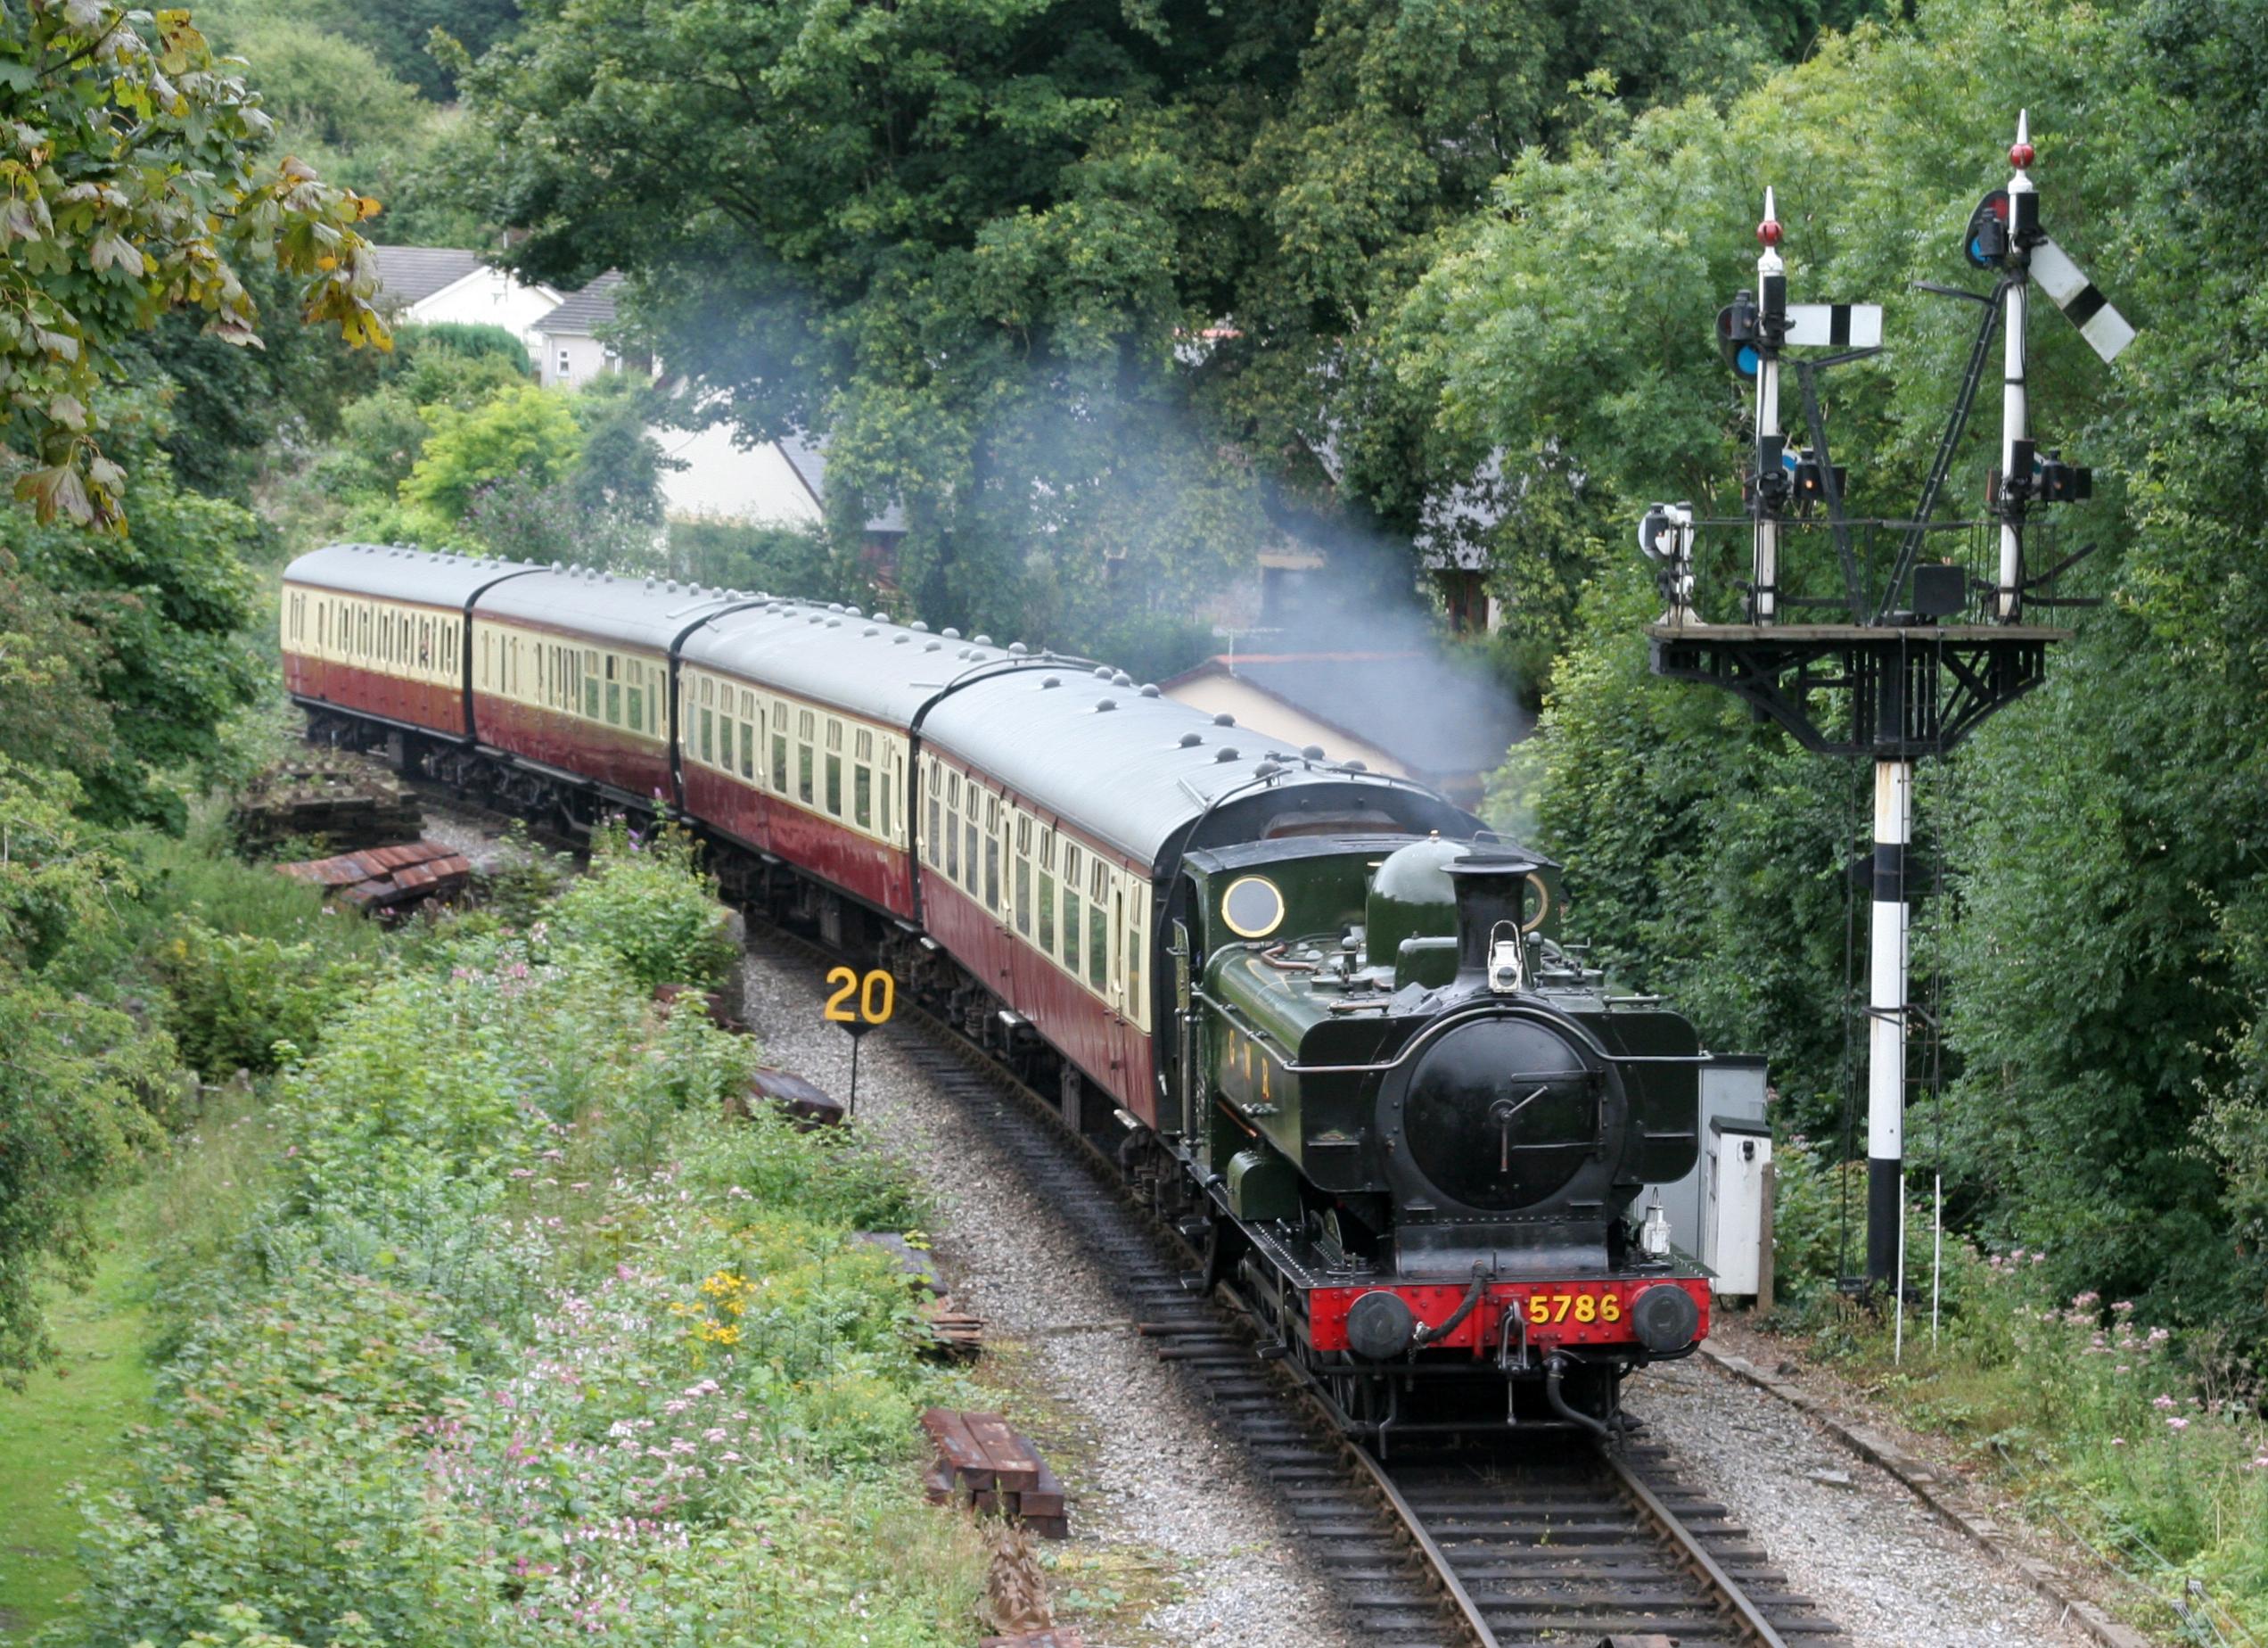 5786_South_Devon_Railway_(3).jpg